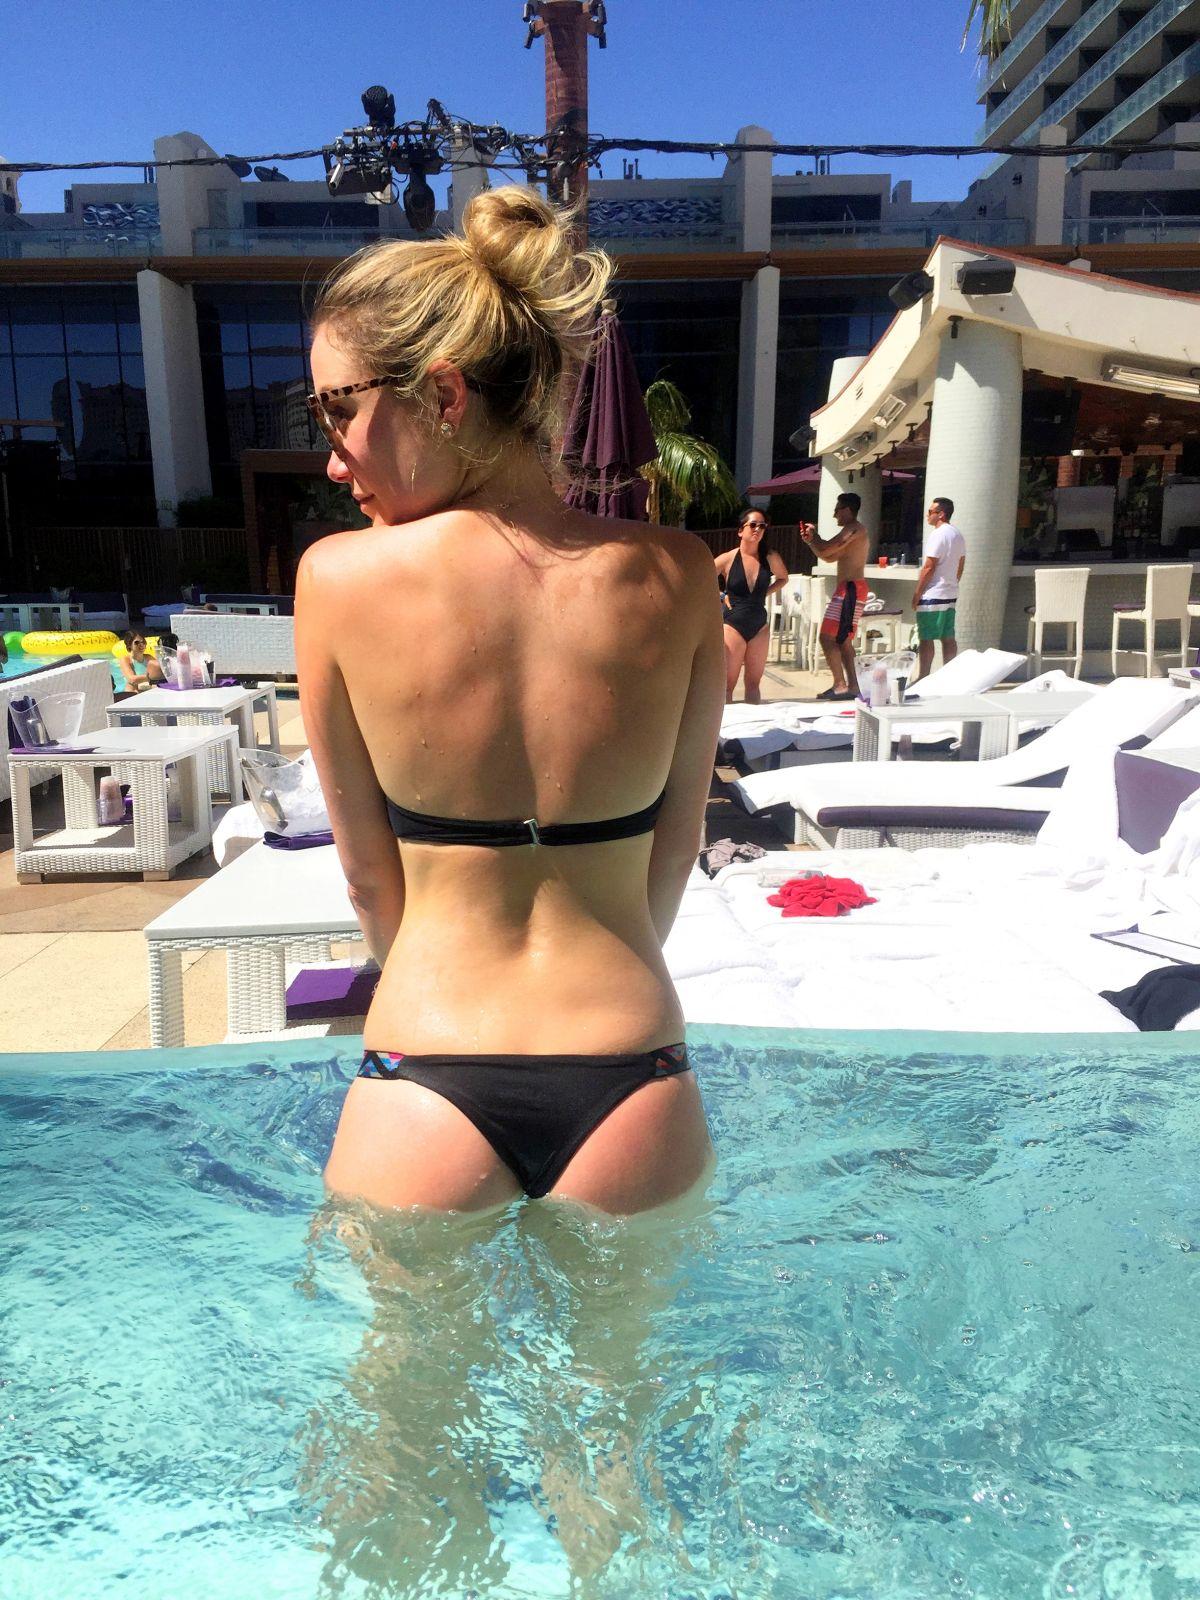 Indeed buffoonery, katrina naked bikini opinion obvious